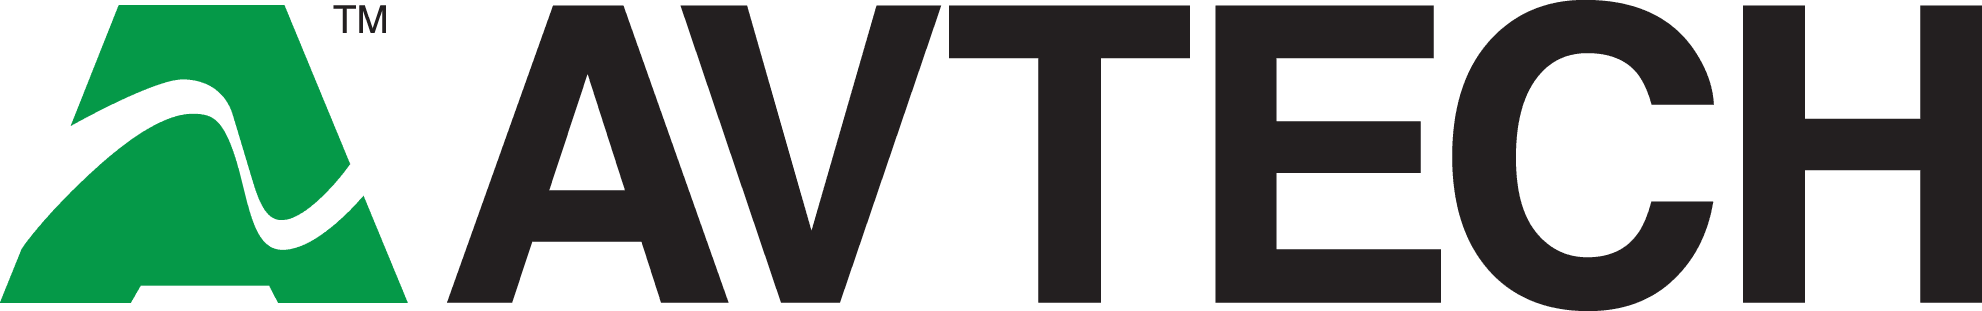 logo-avtech